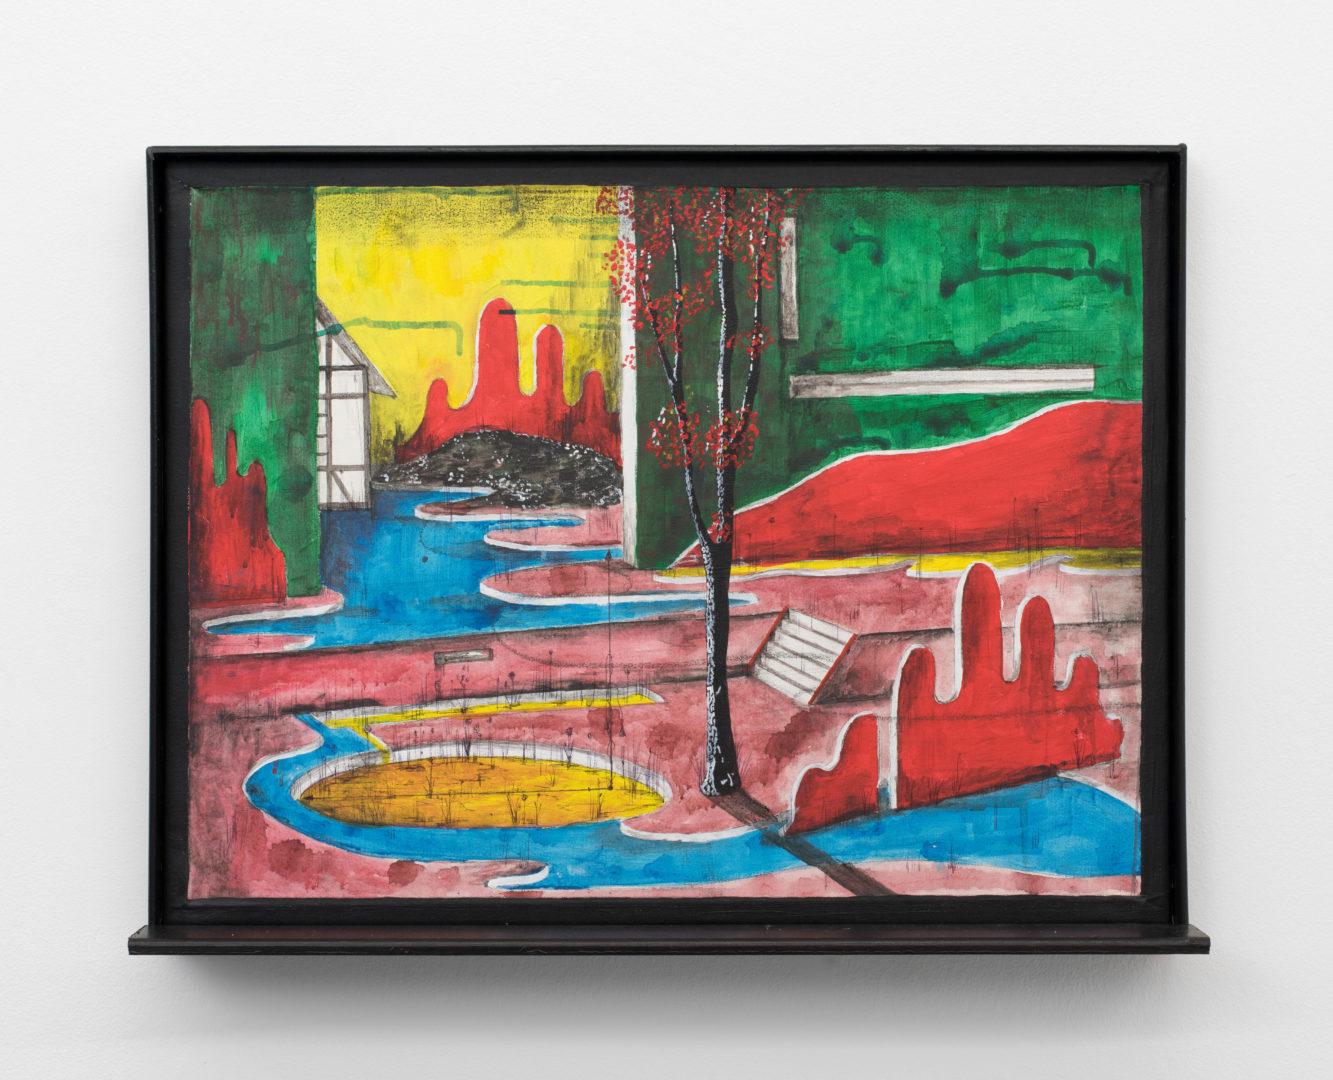 "Exhibition View Veit Laurent Kurz ""Window V (AOA Series), 2018"" at Weiss Falk / Courtesy: Weiss Falk and the artist"